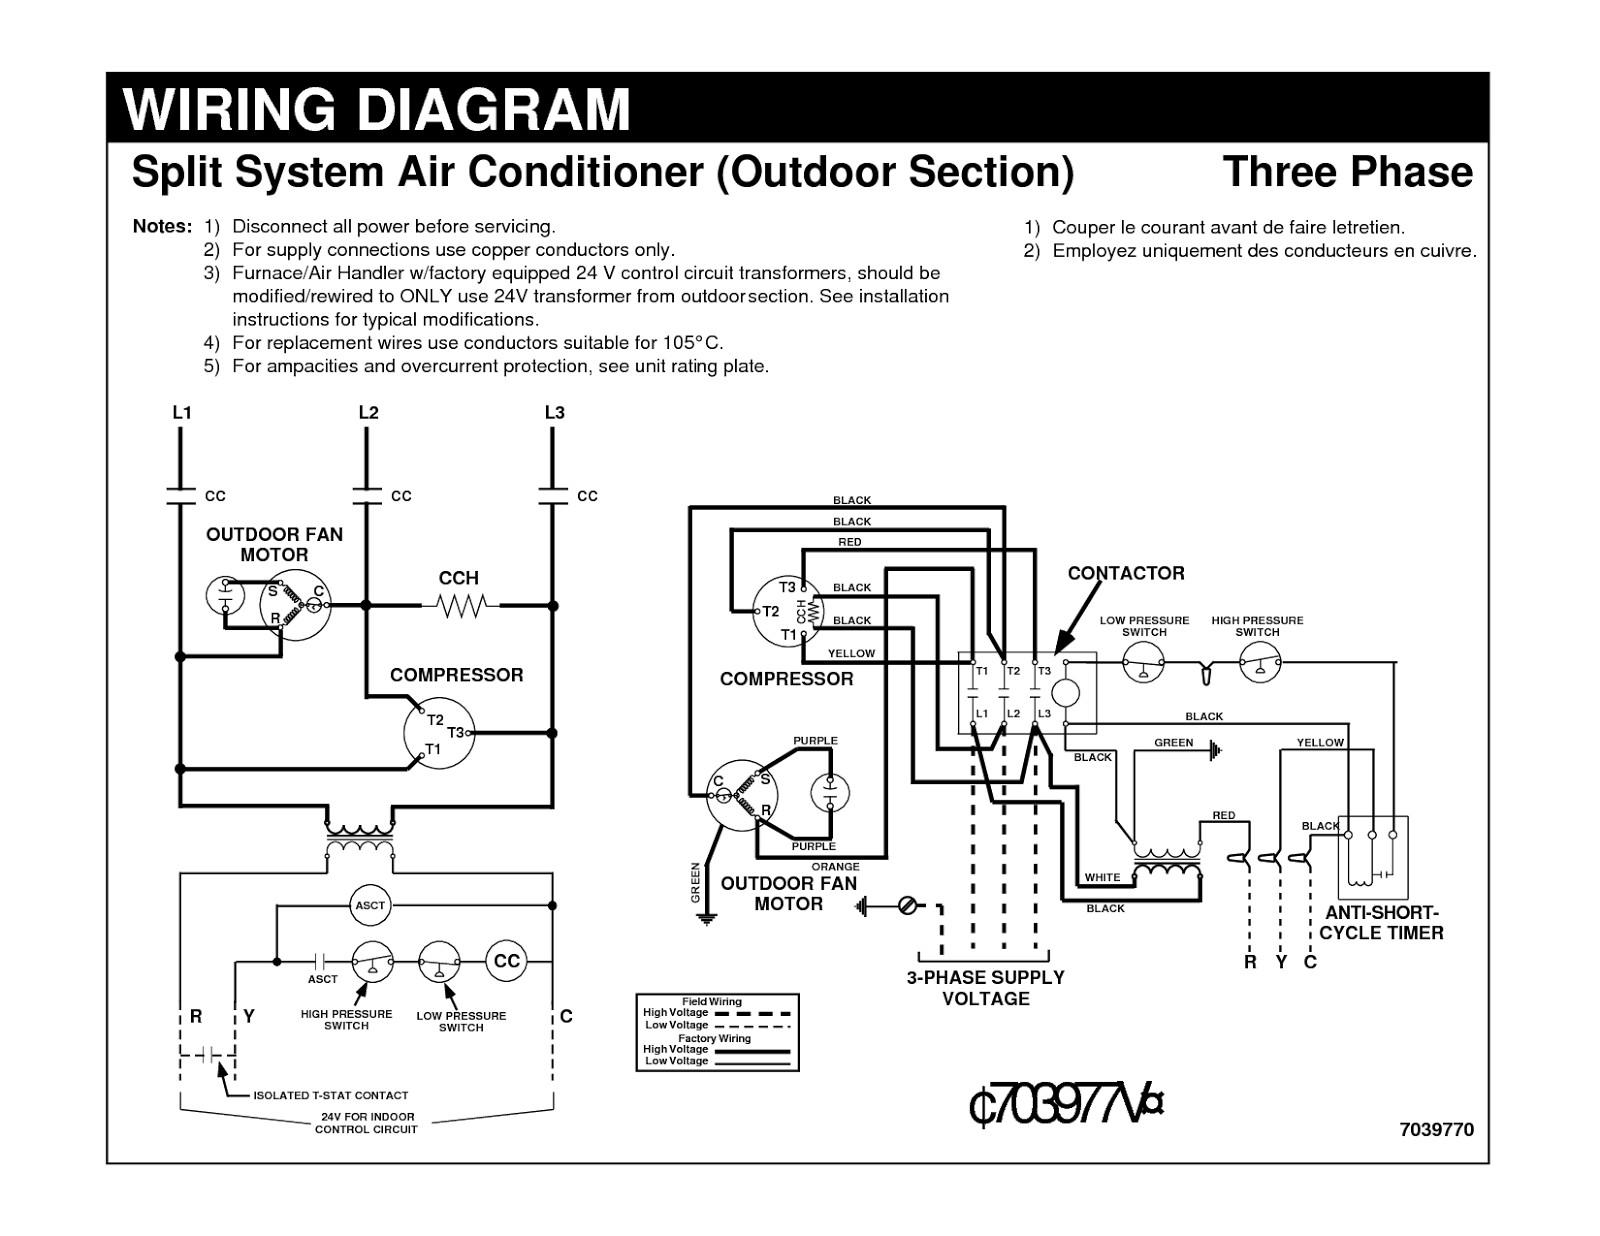 Air Conditioner Wiring Diagram Wiring Diagram Hvac